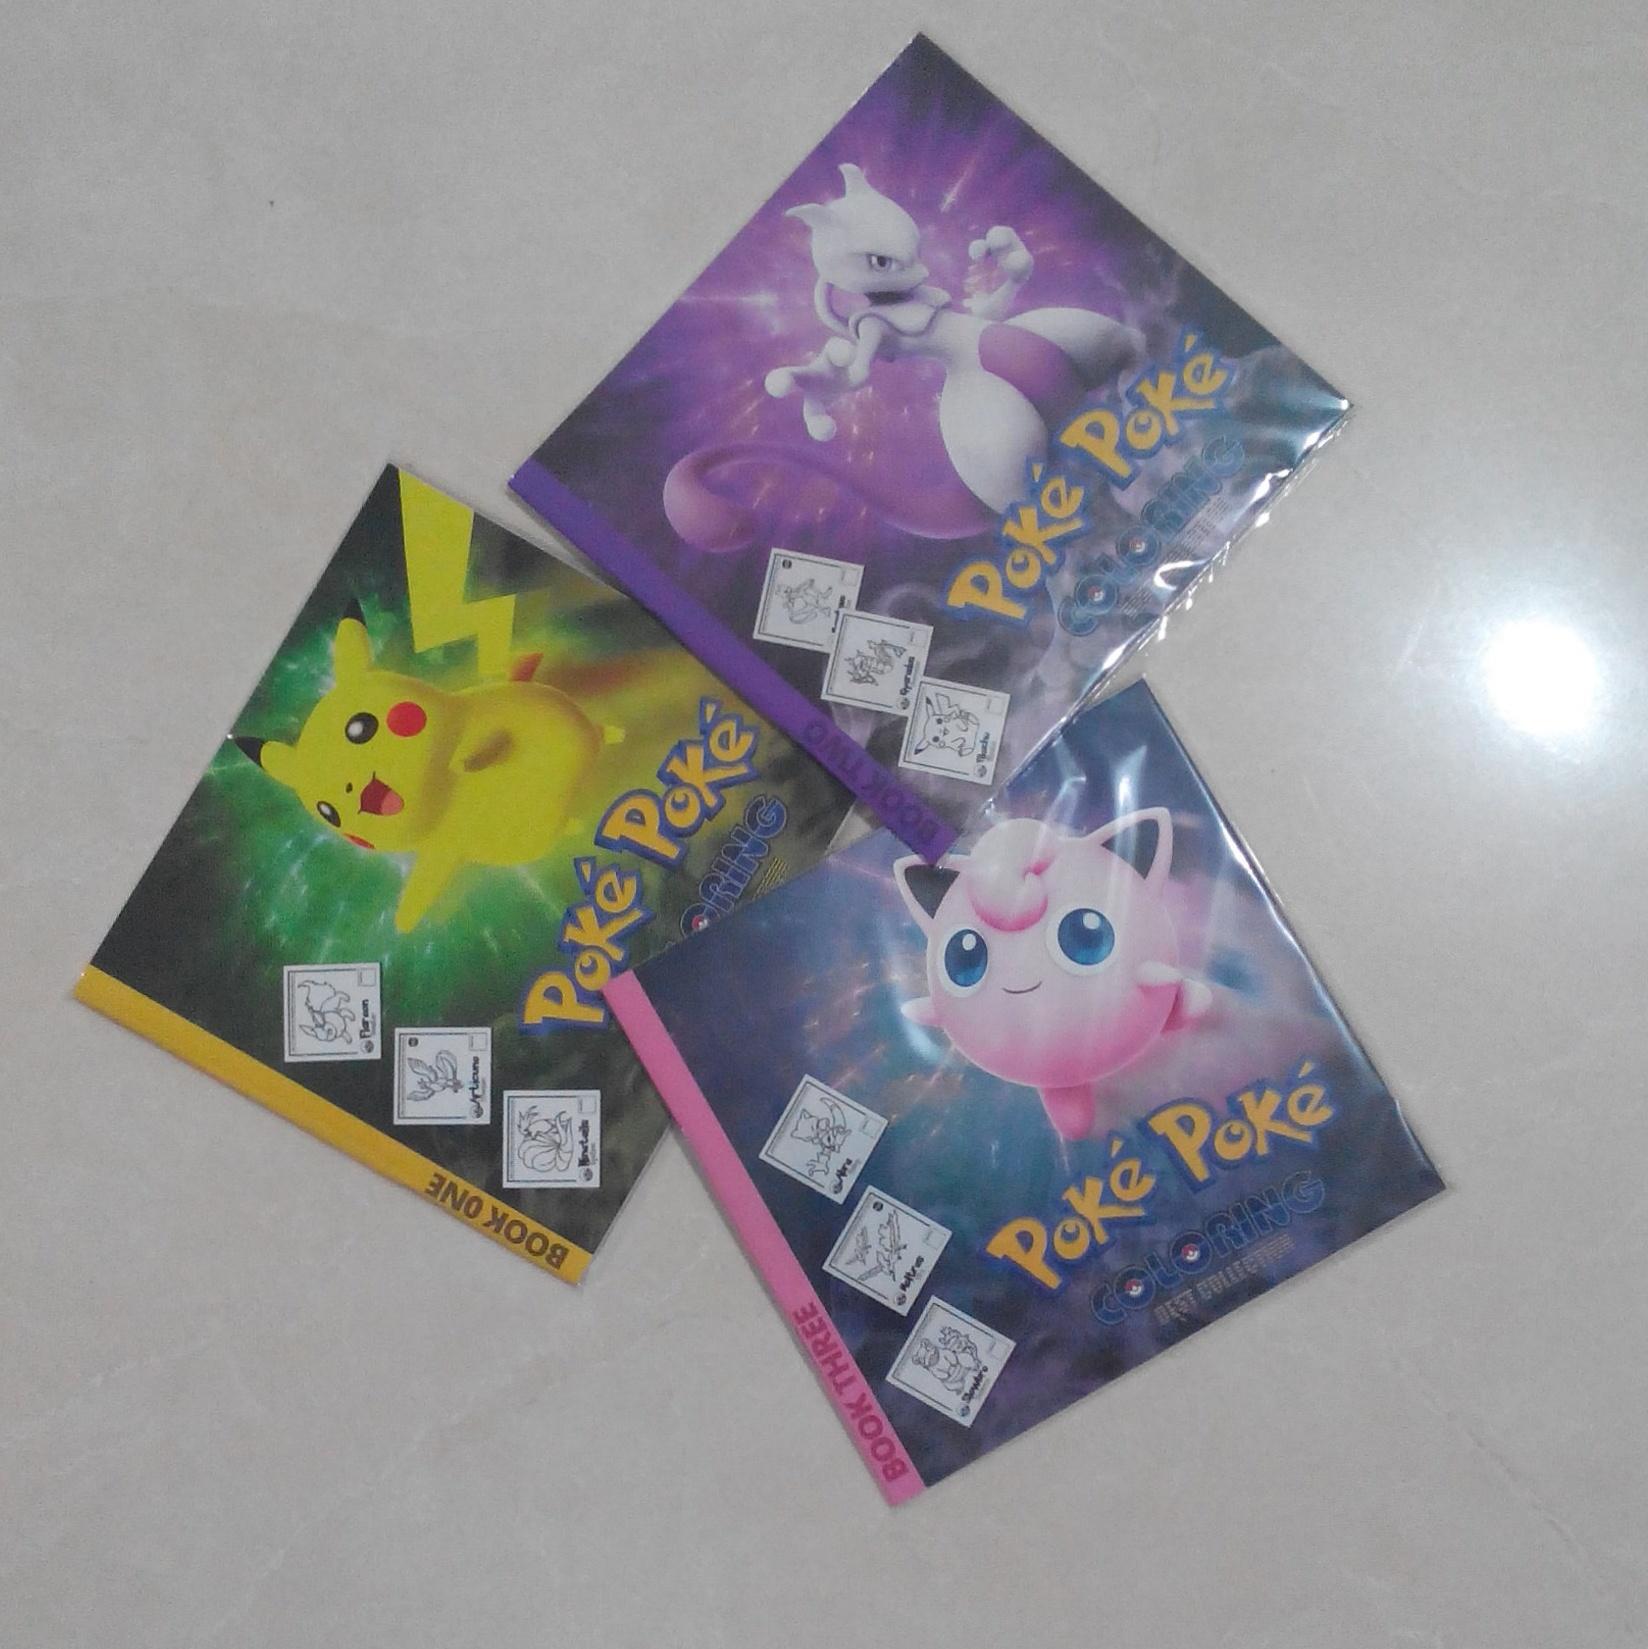 Jual Satu Set Buku Gambar Mewarnai Pokemon Limited Edition Kota